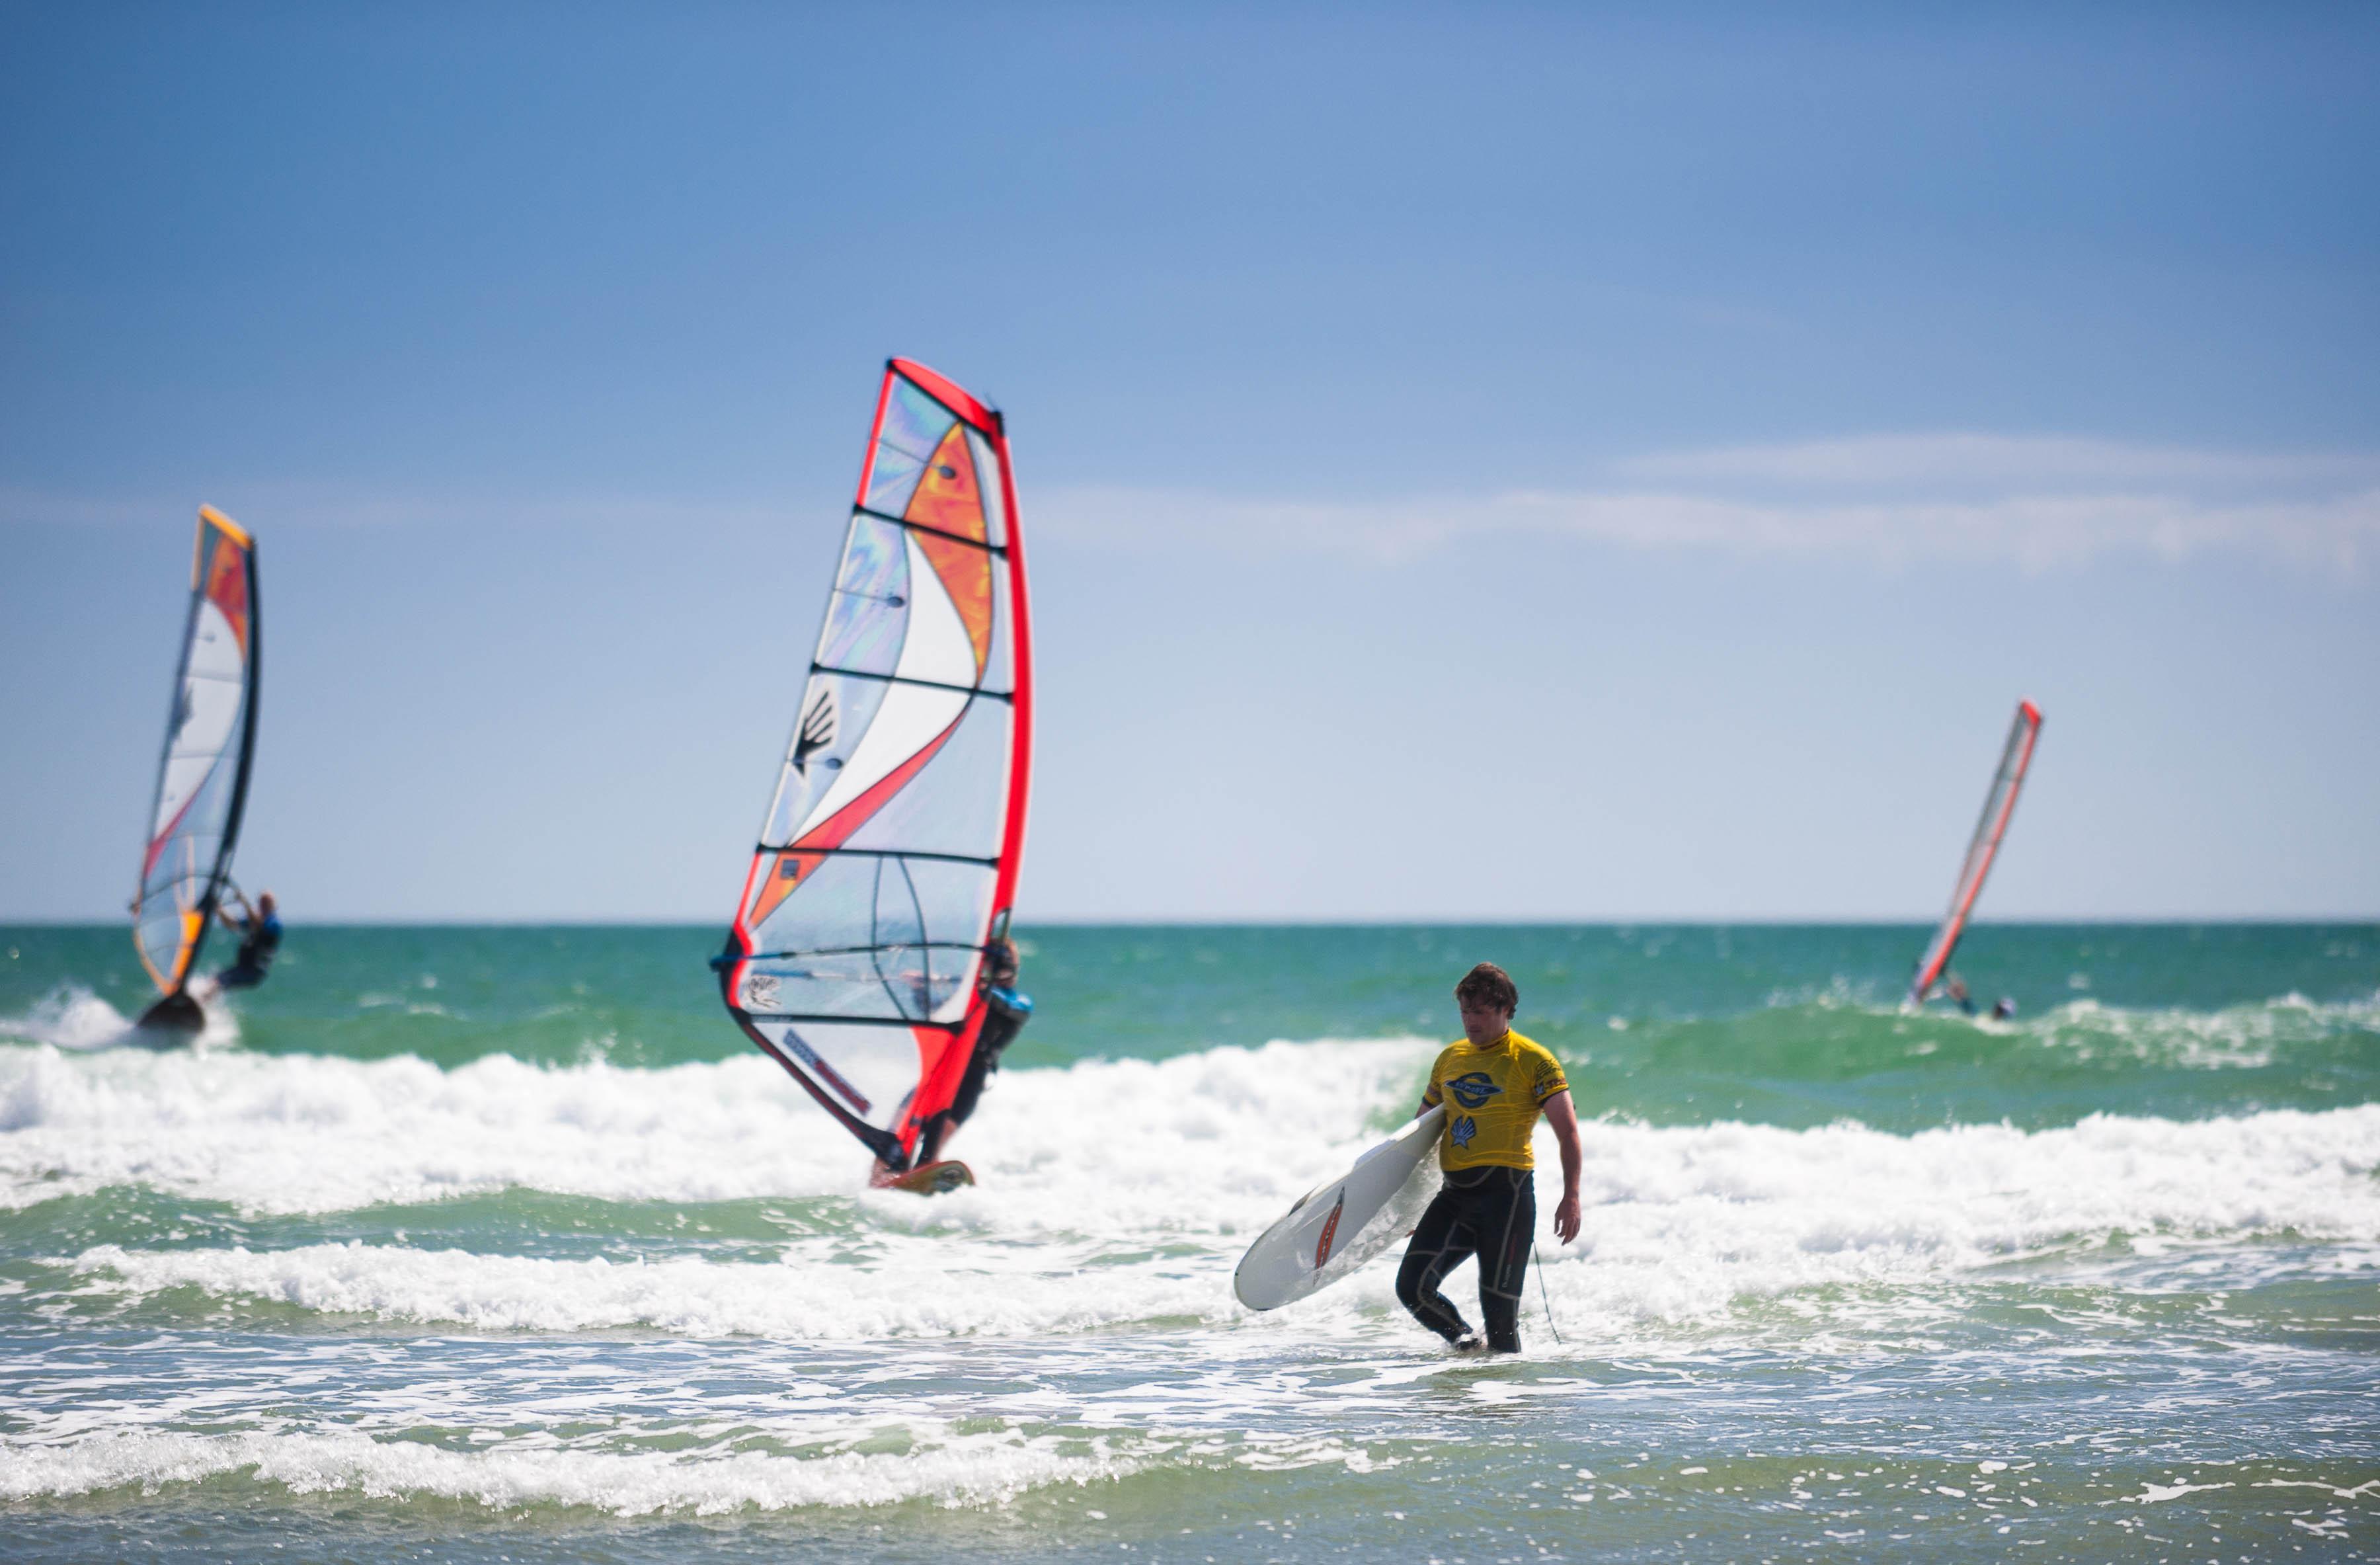 a man kite surfing in the ocean